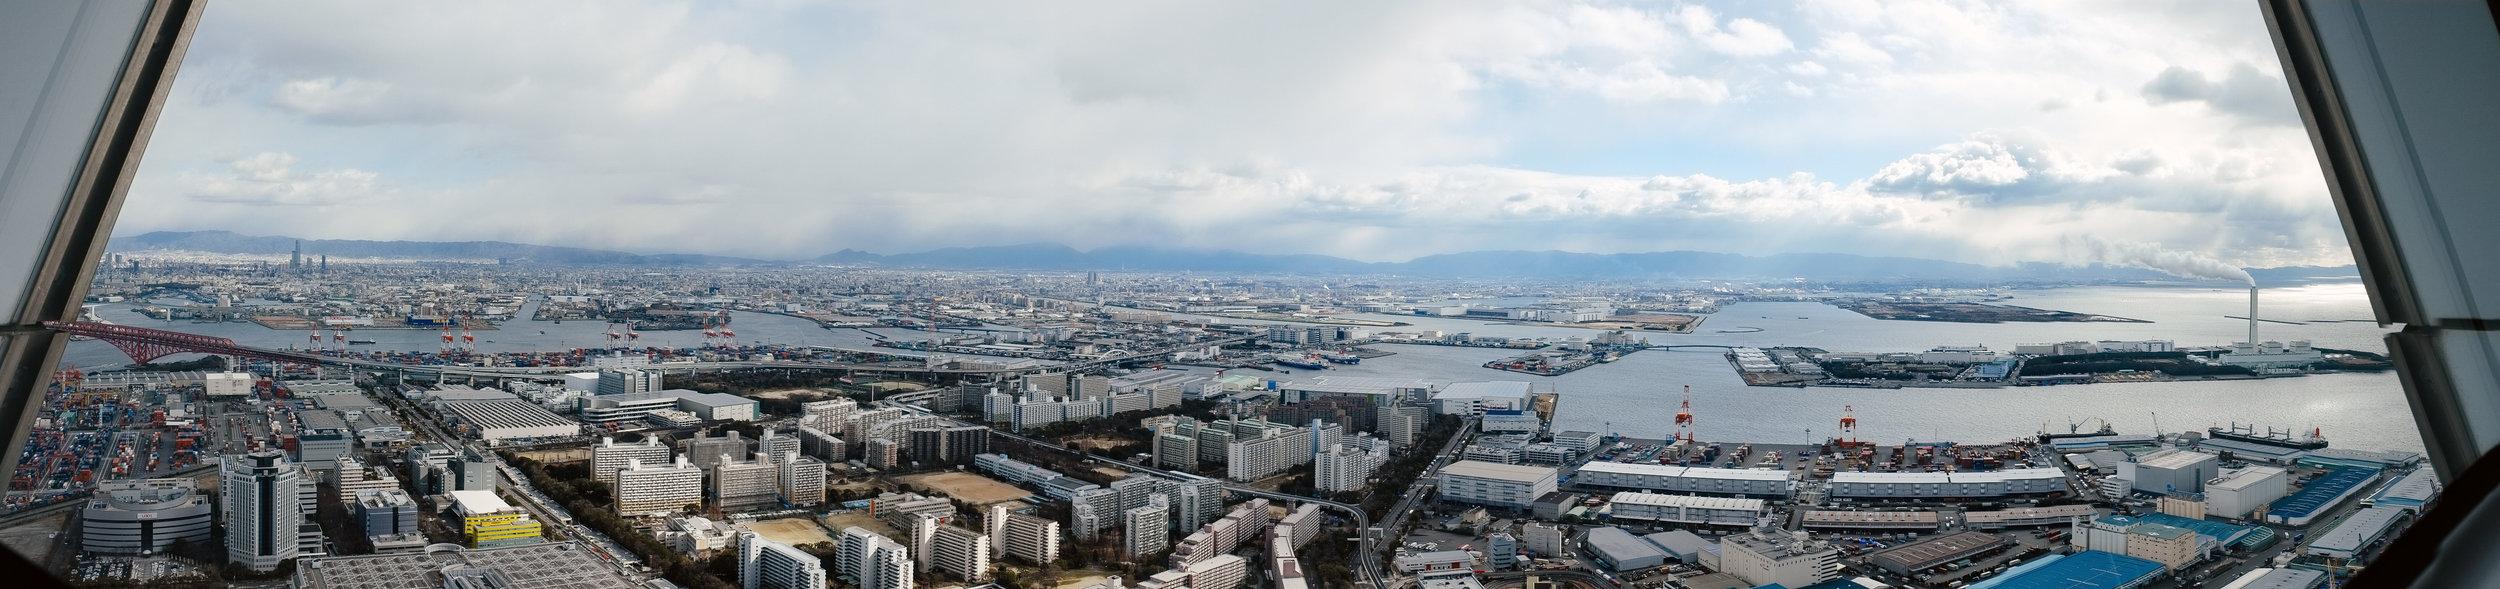 Osaka Pano 1.jpg